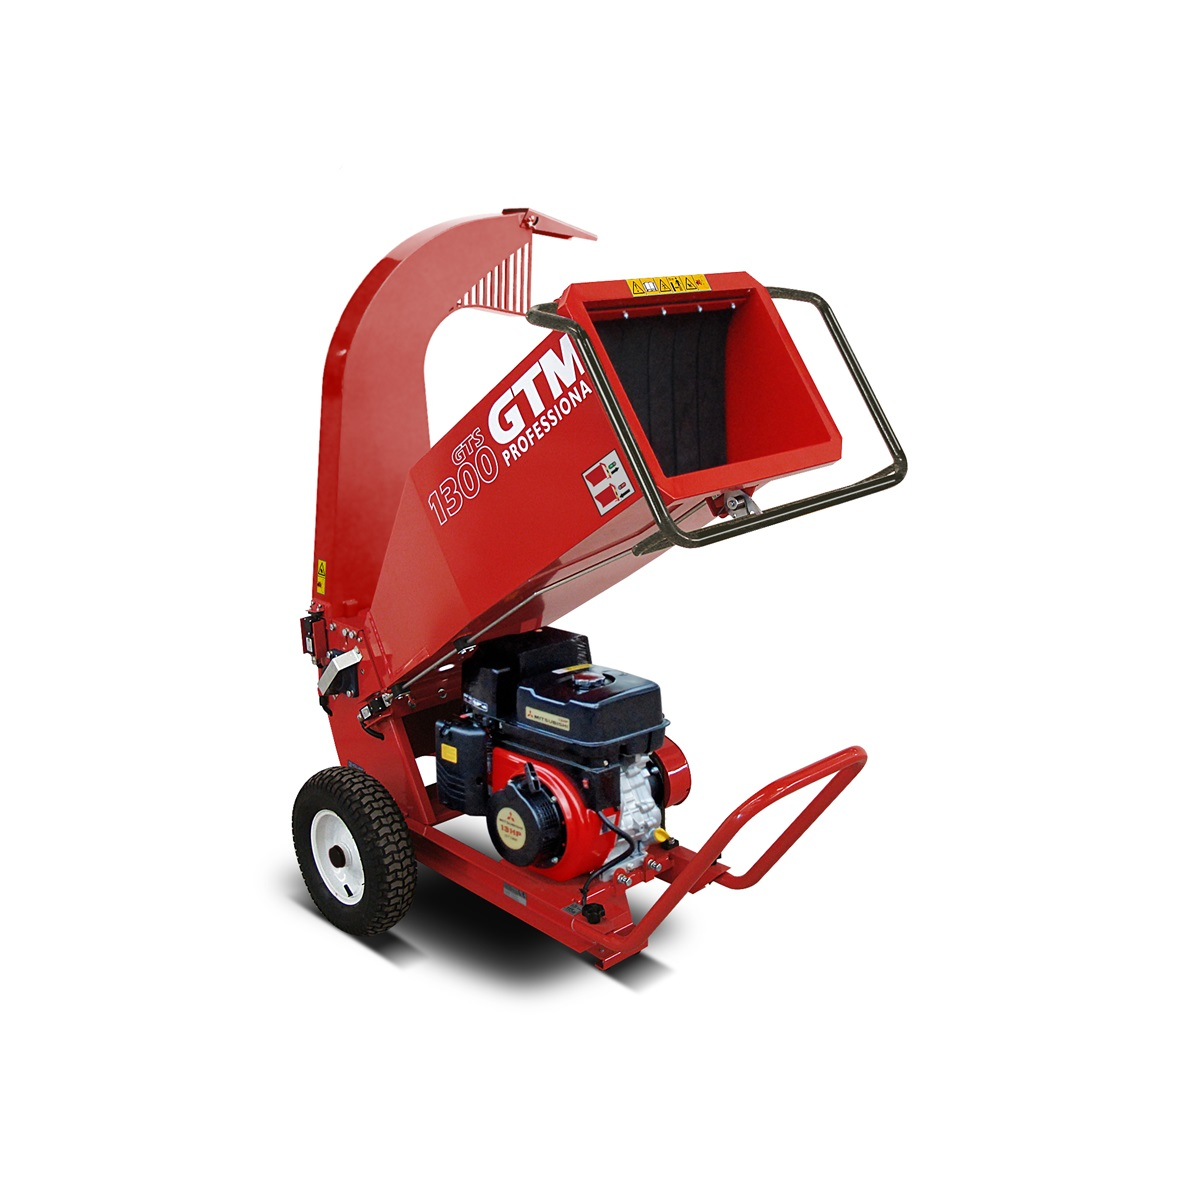 GTM GTS 1300M, drtič dřeva s benzinovým motorem